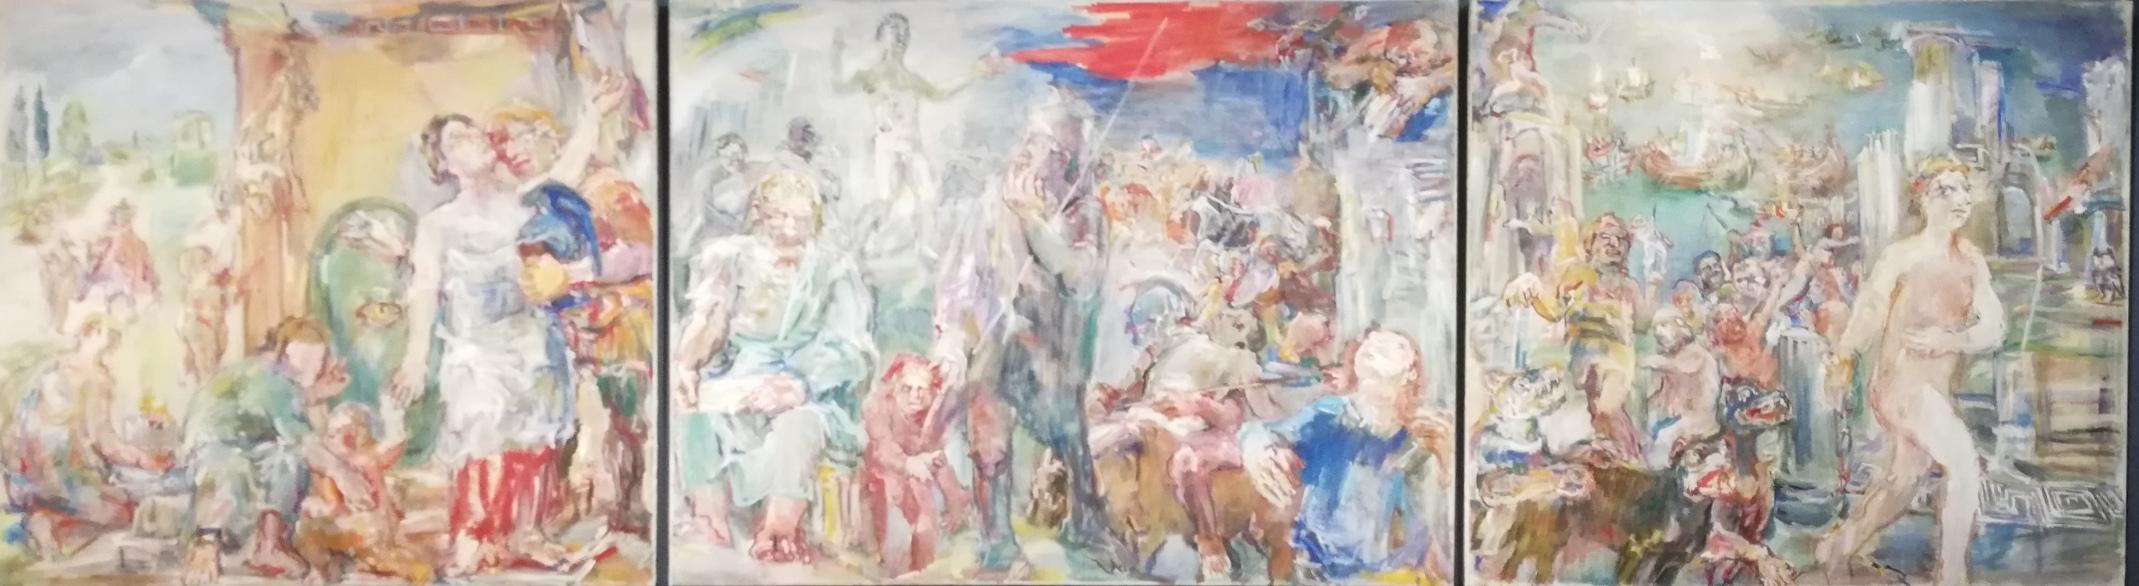 "Oskar Kokoschka, ""Trittico delle Termopili"" (1954)"